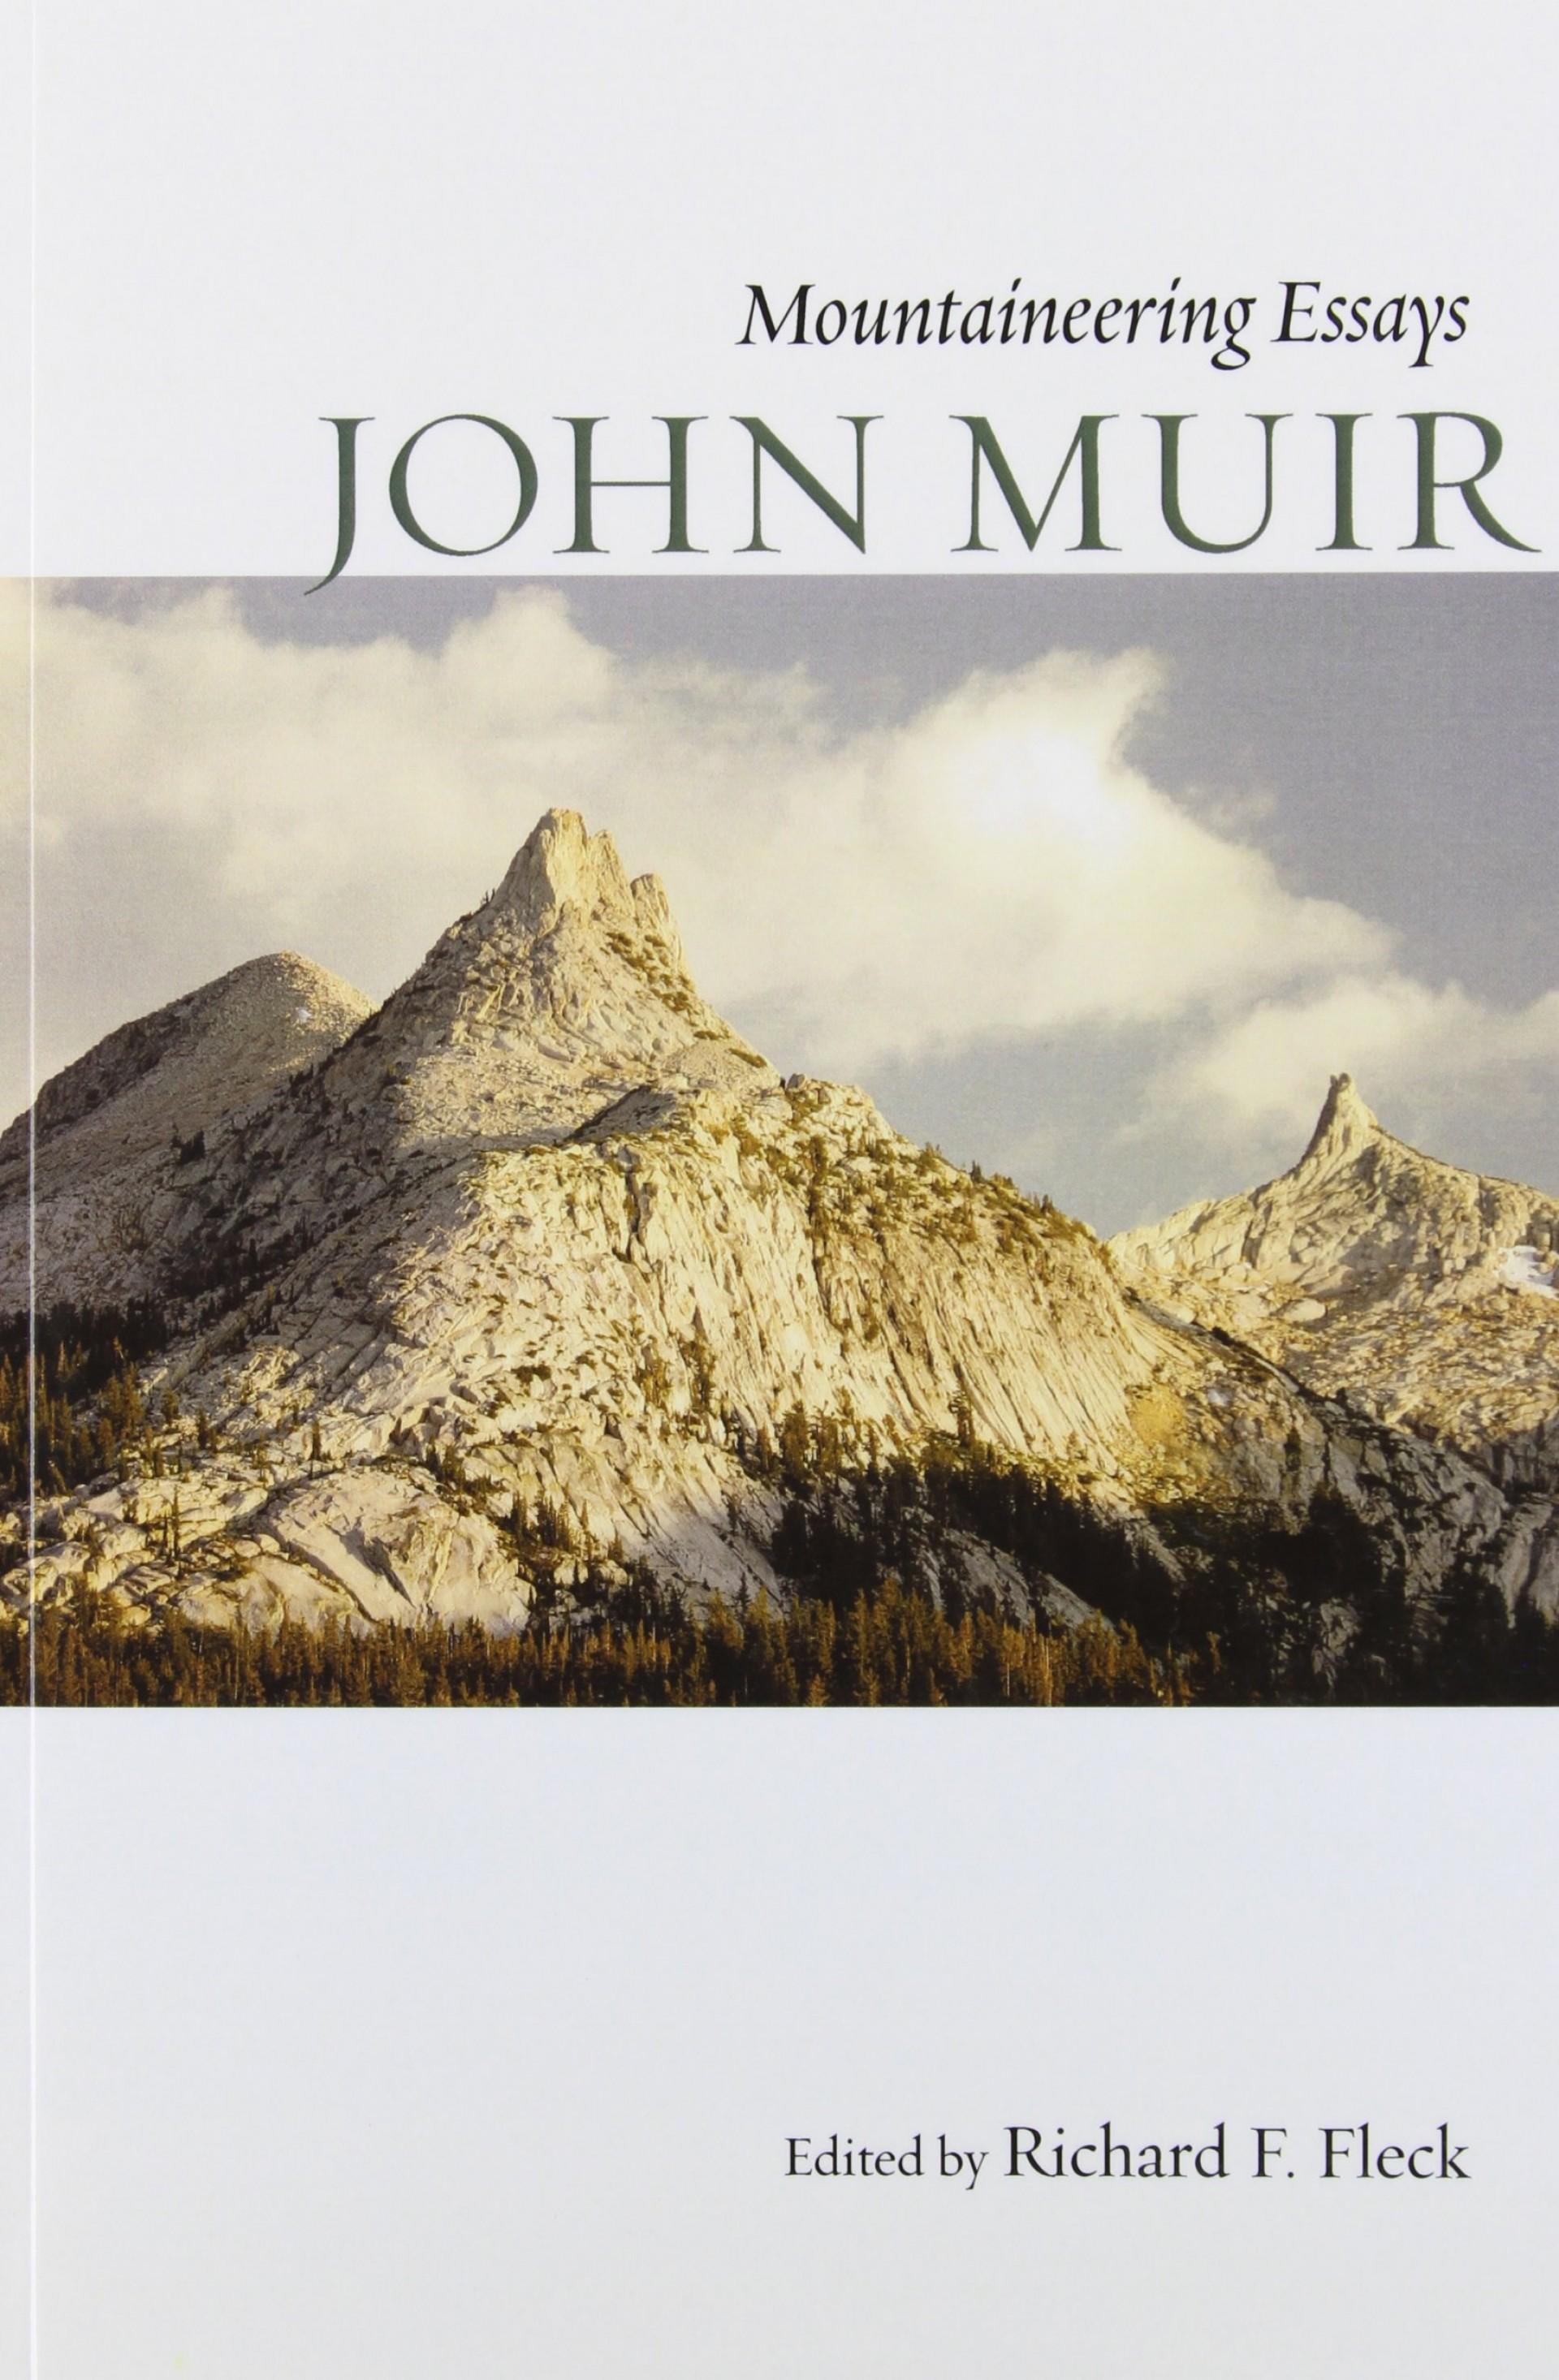 018 817oif2bioml John Muir Wilderness Essays Essay Best Pdf Review 1920